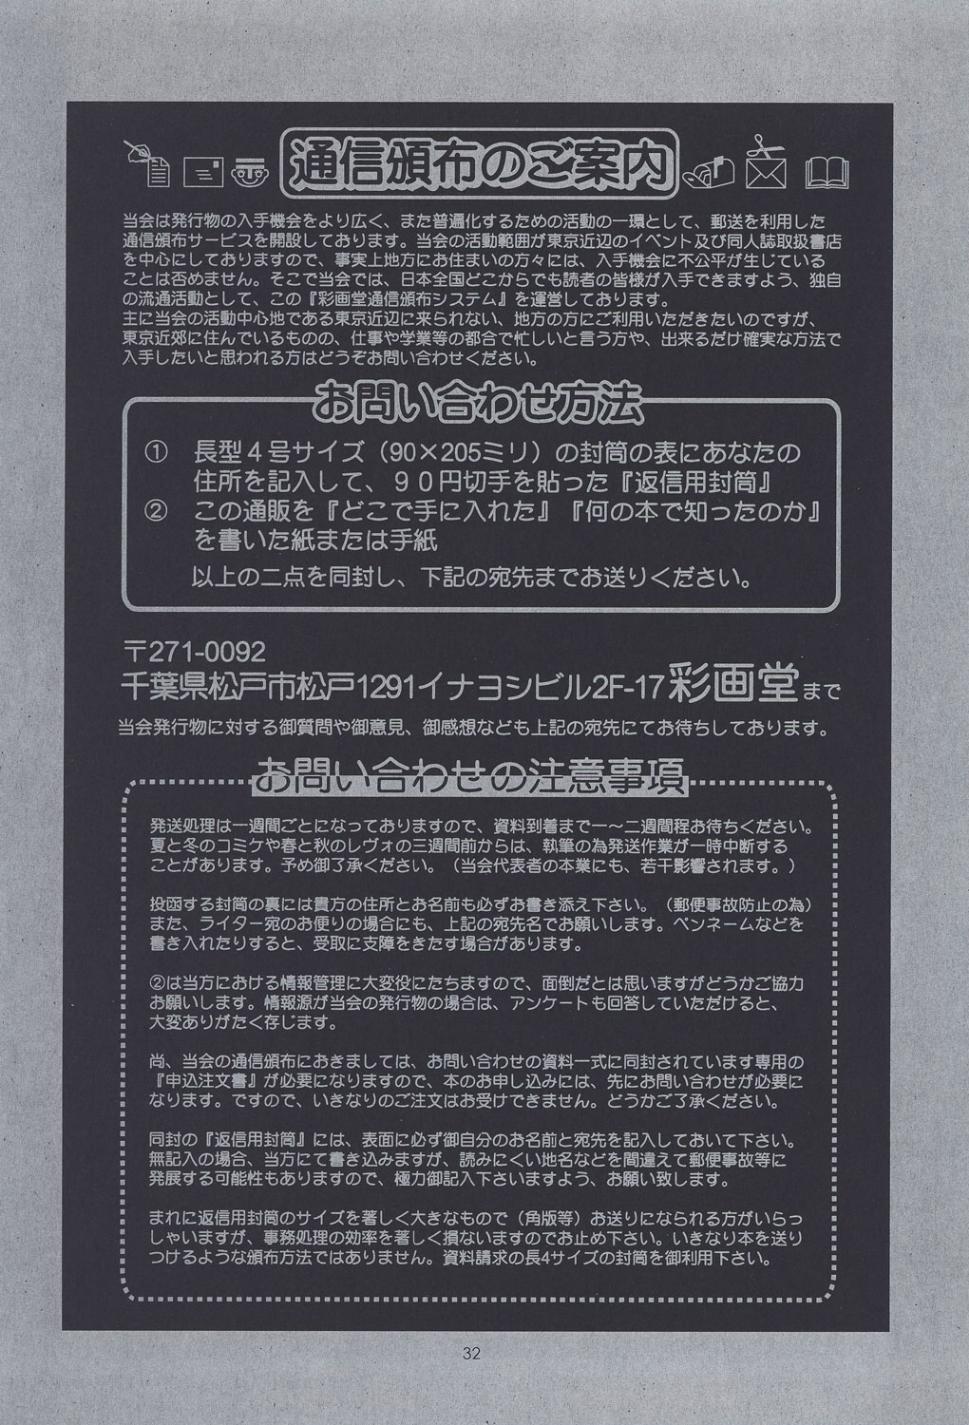 The Yuri & Friends Fullcolor 4 SAKURA vs. YURI EDITION 30